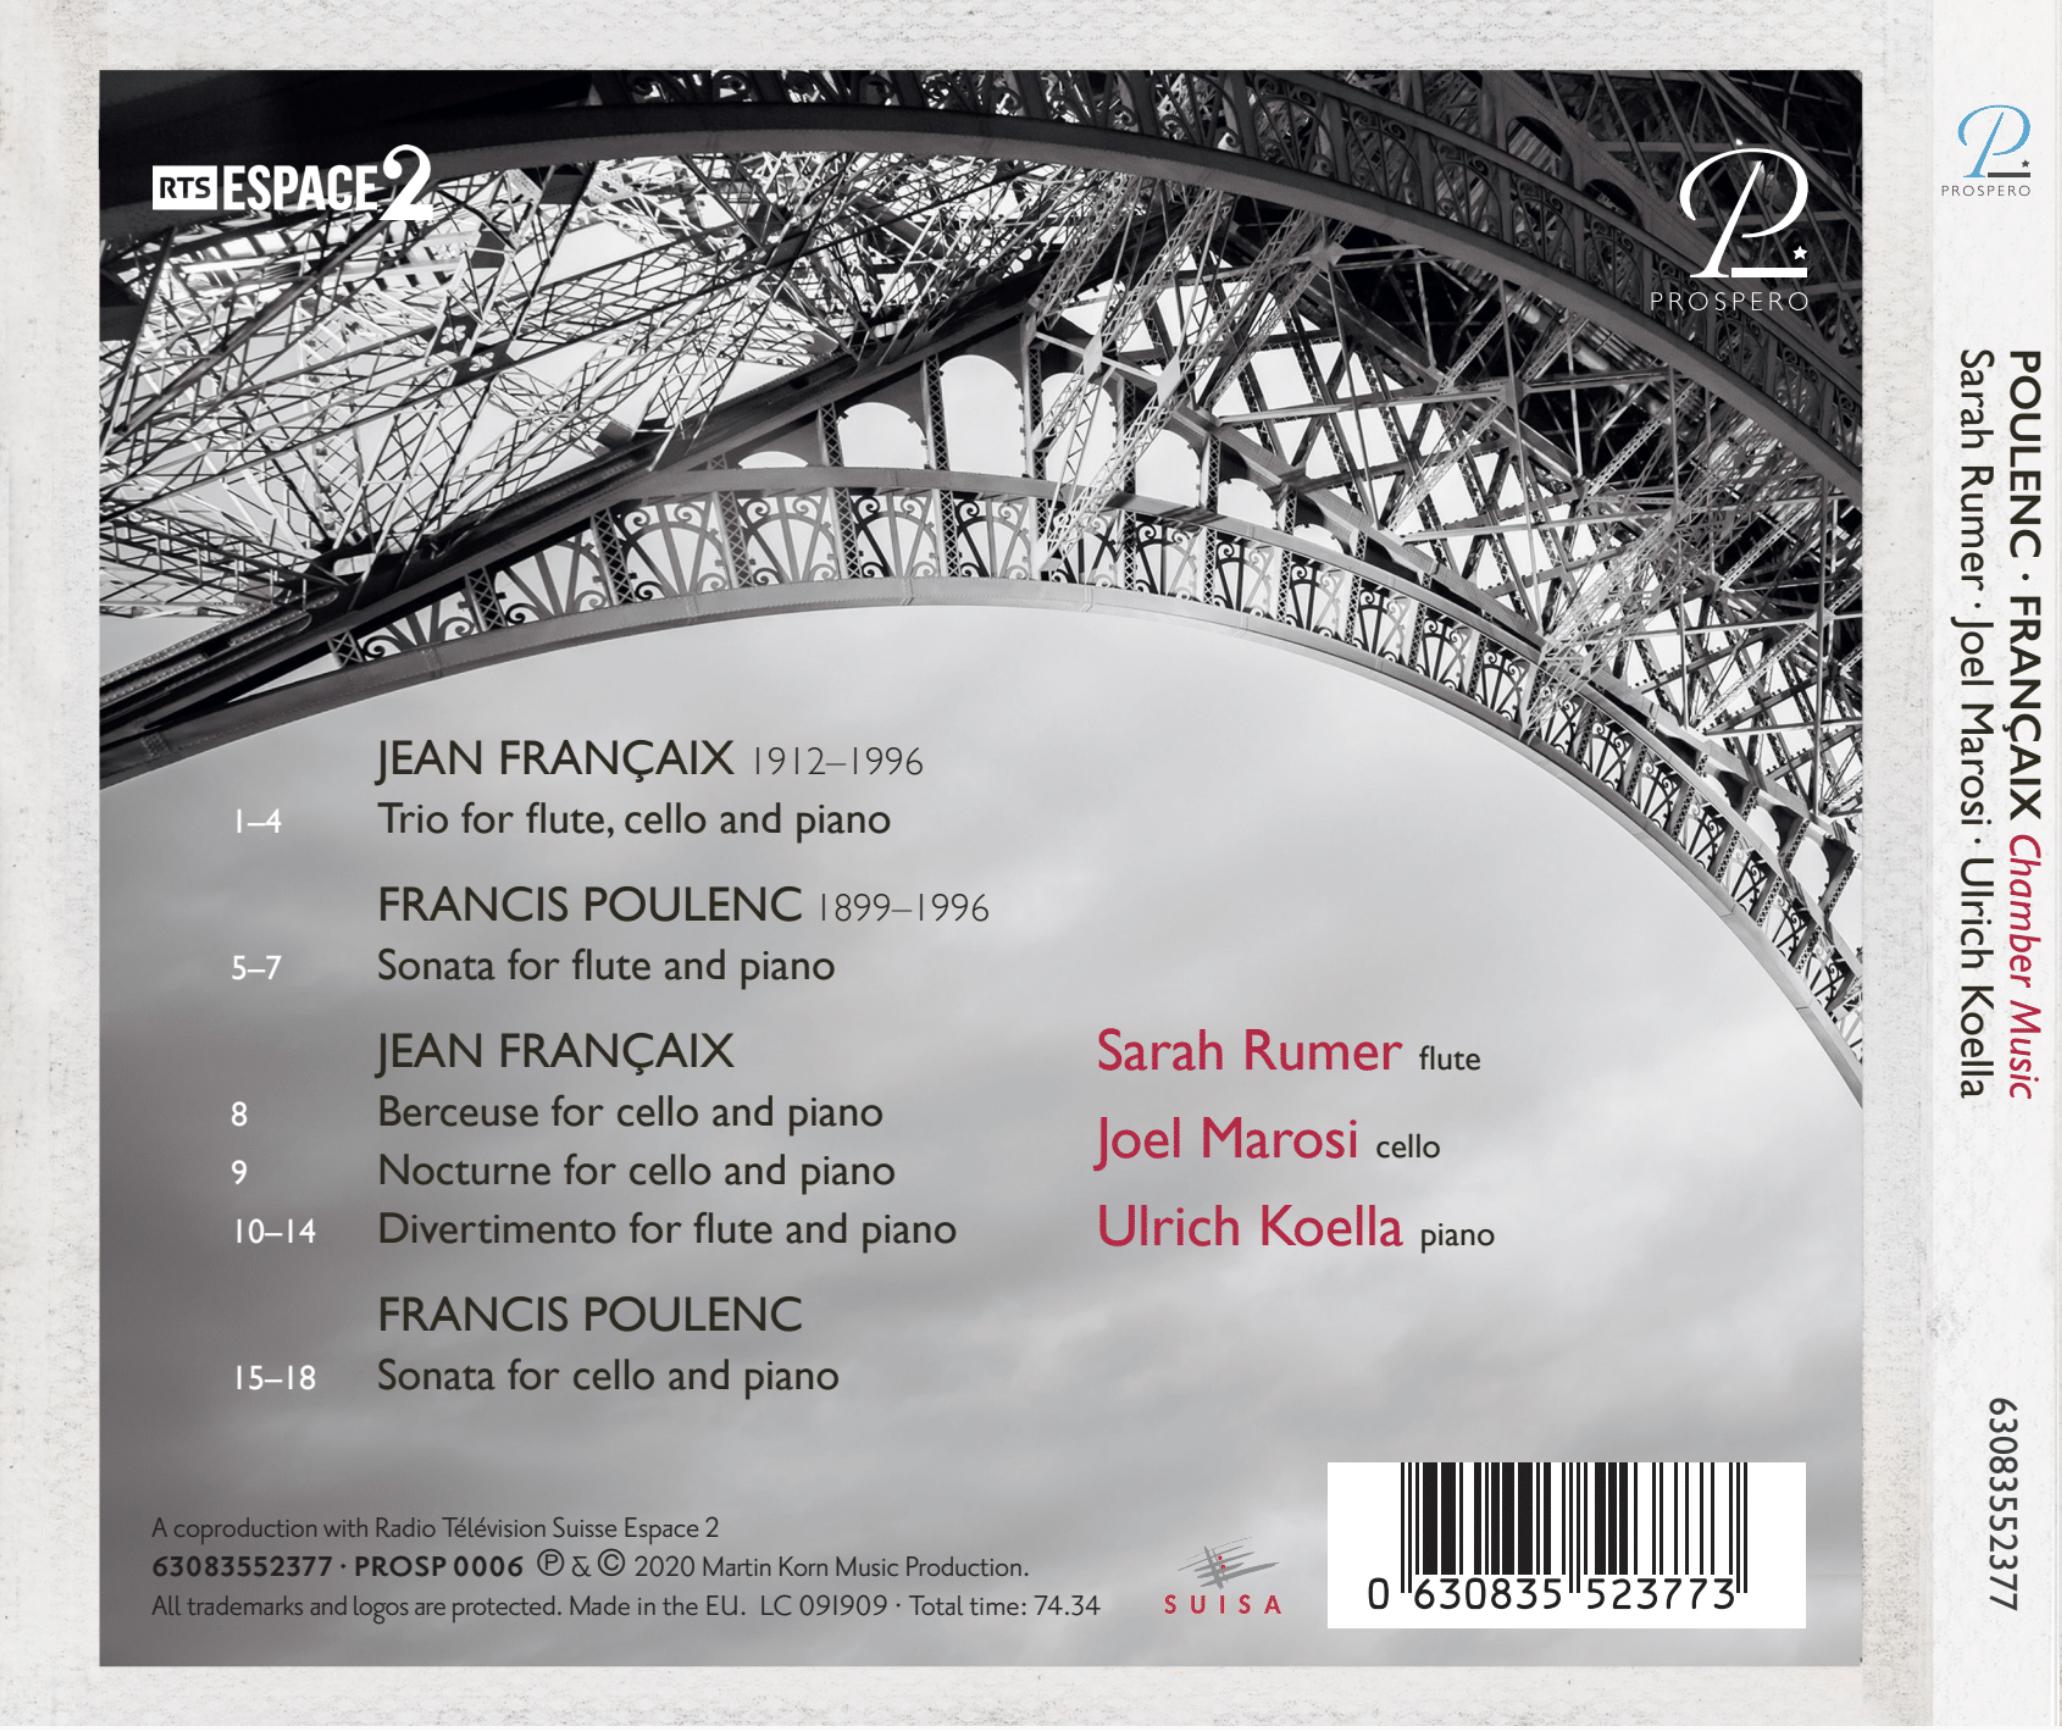 French Chamber Music - Digipack Back